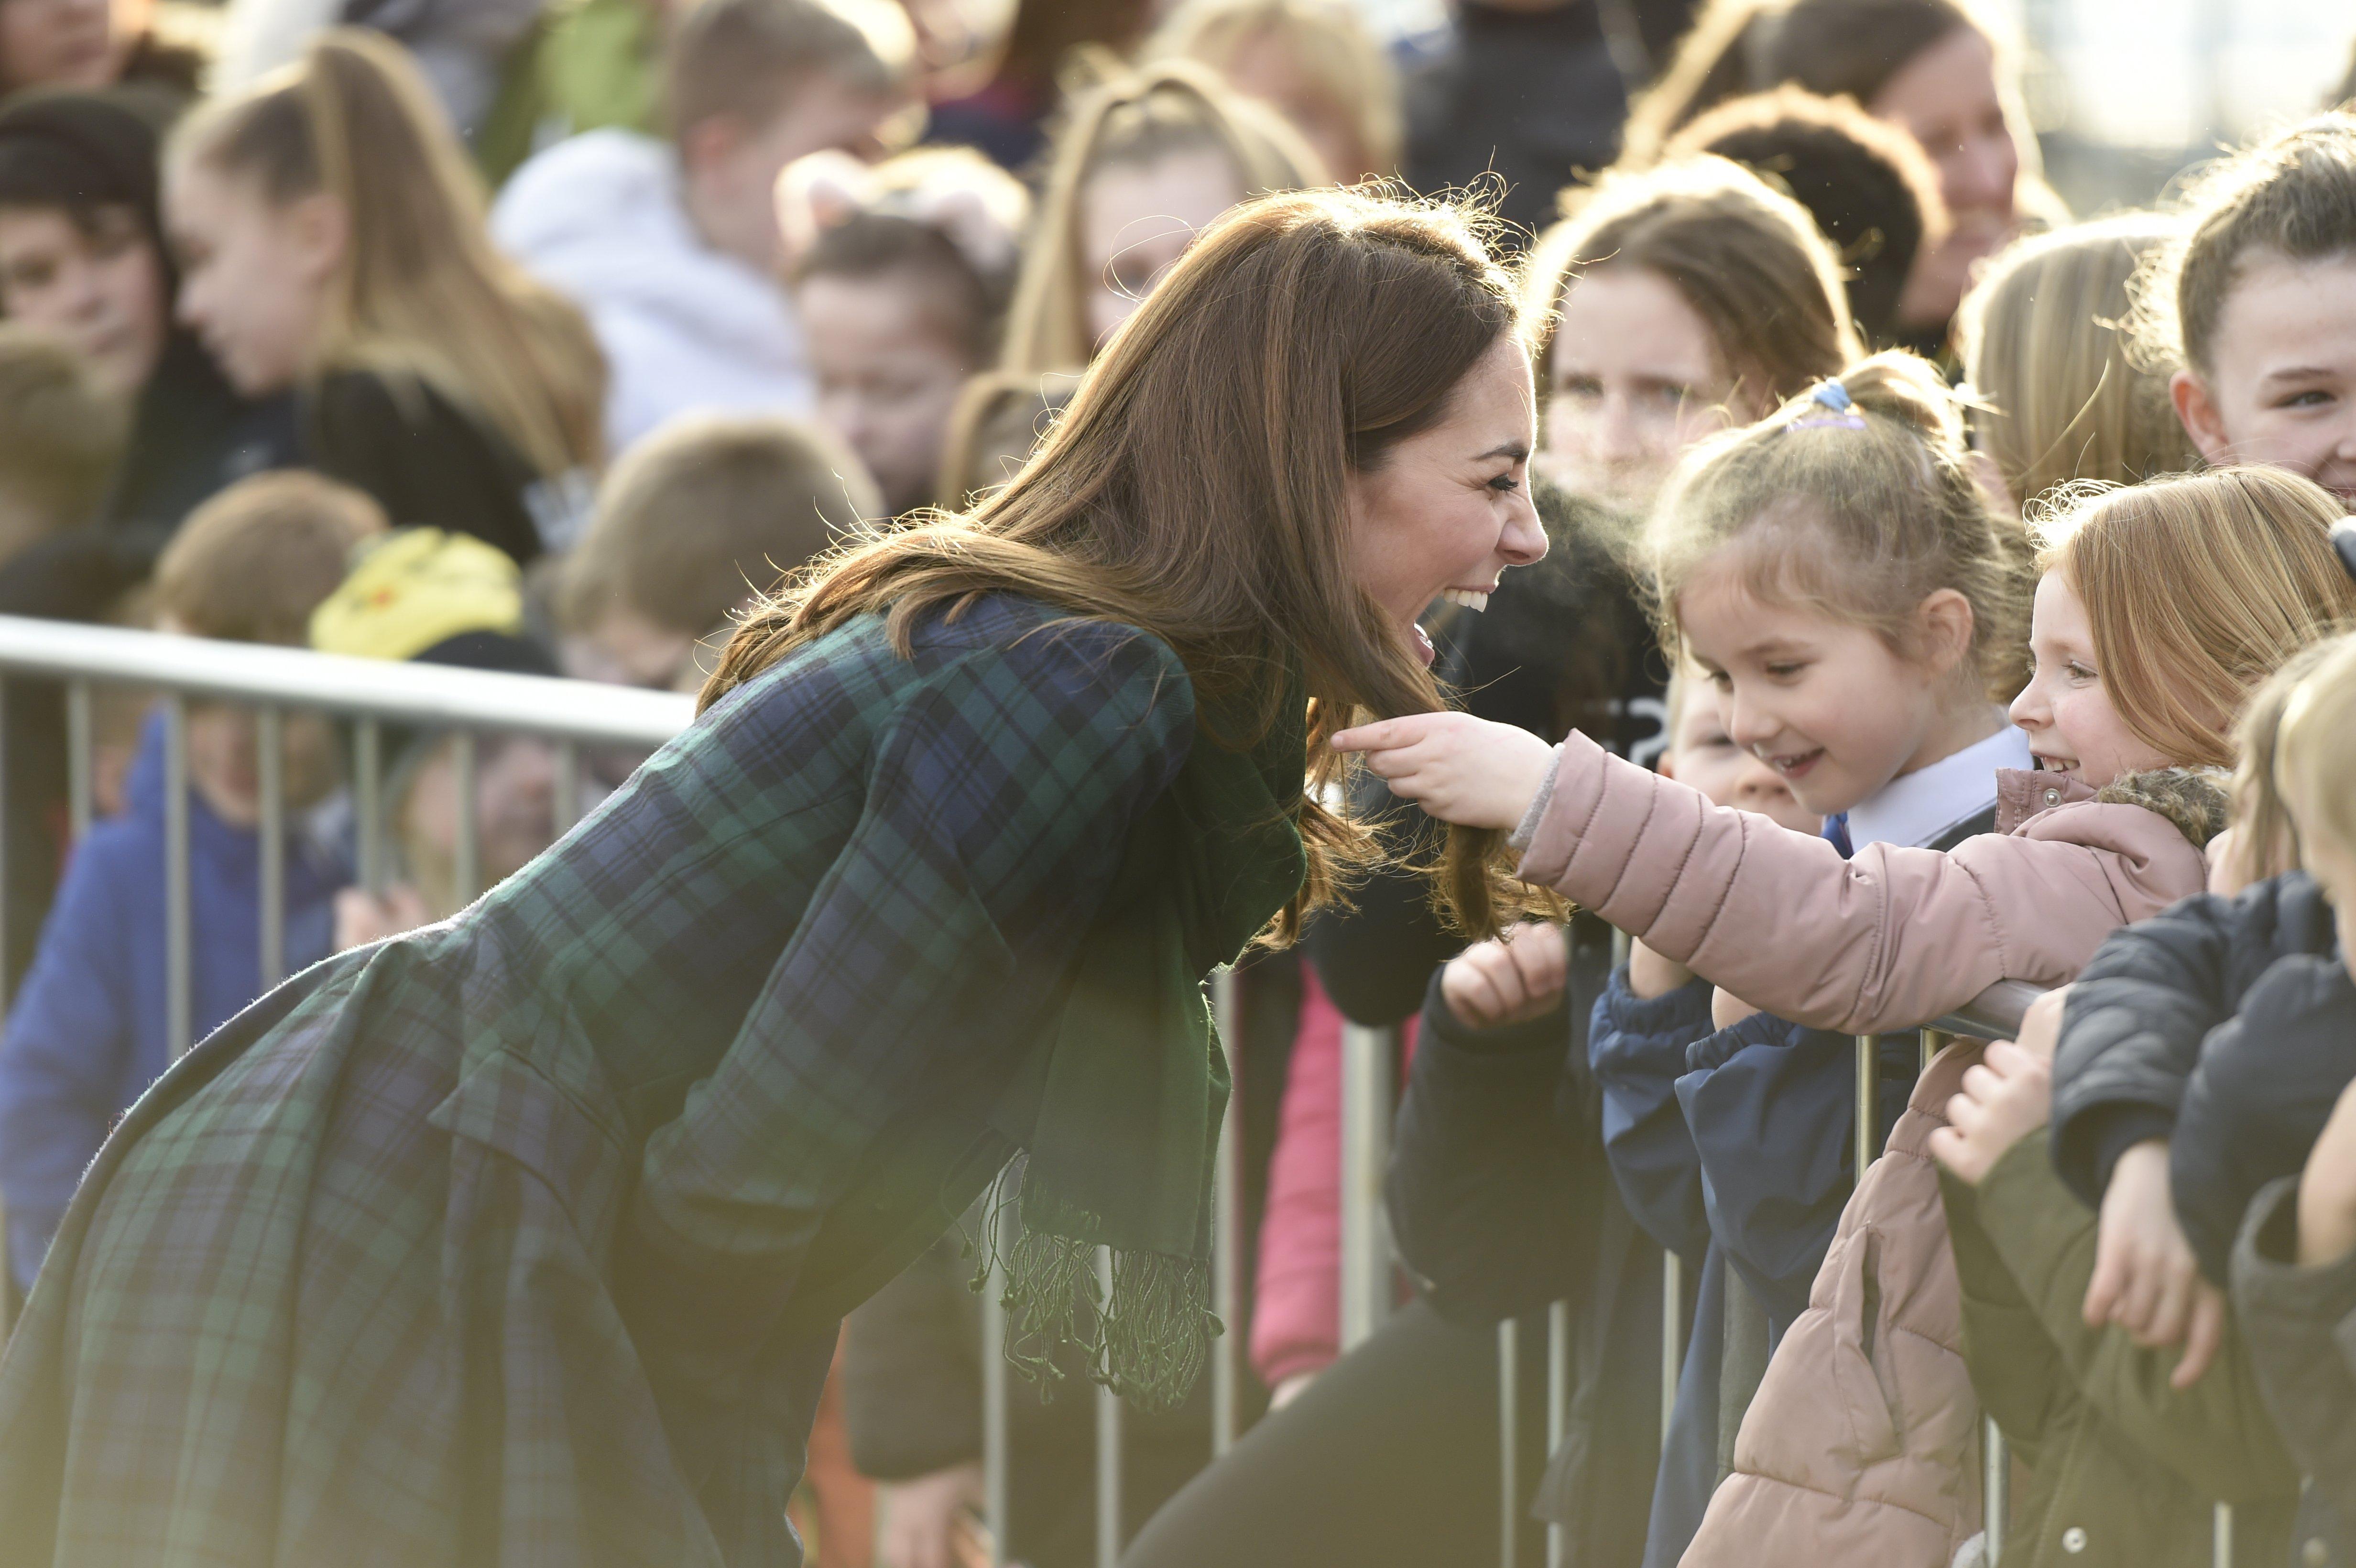 Kate Middleton lors du rassemblement à Dundee l Source: Getty Images